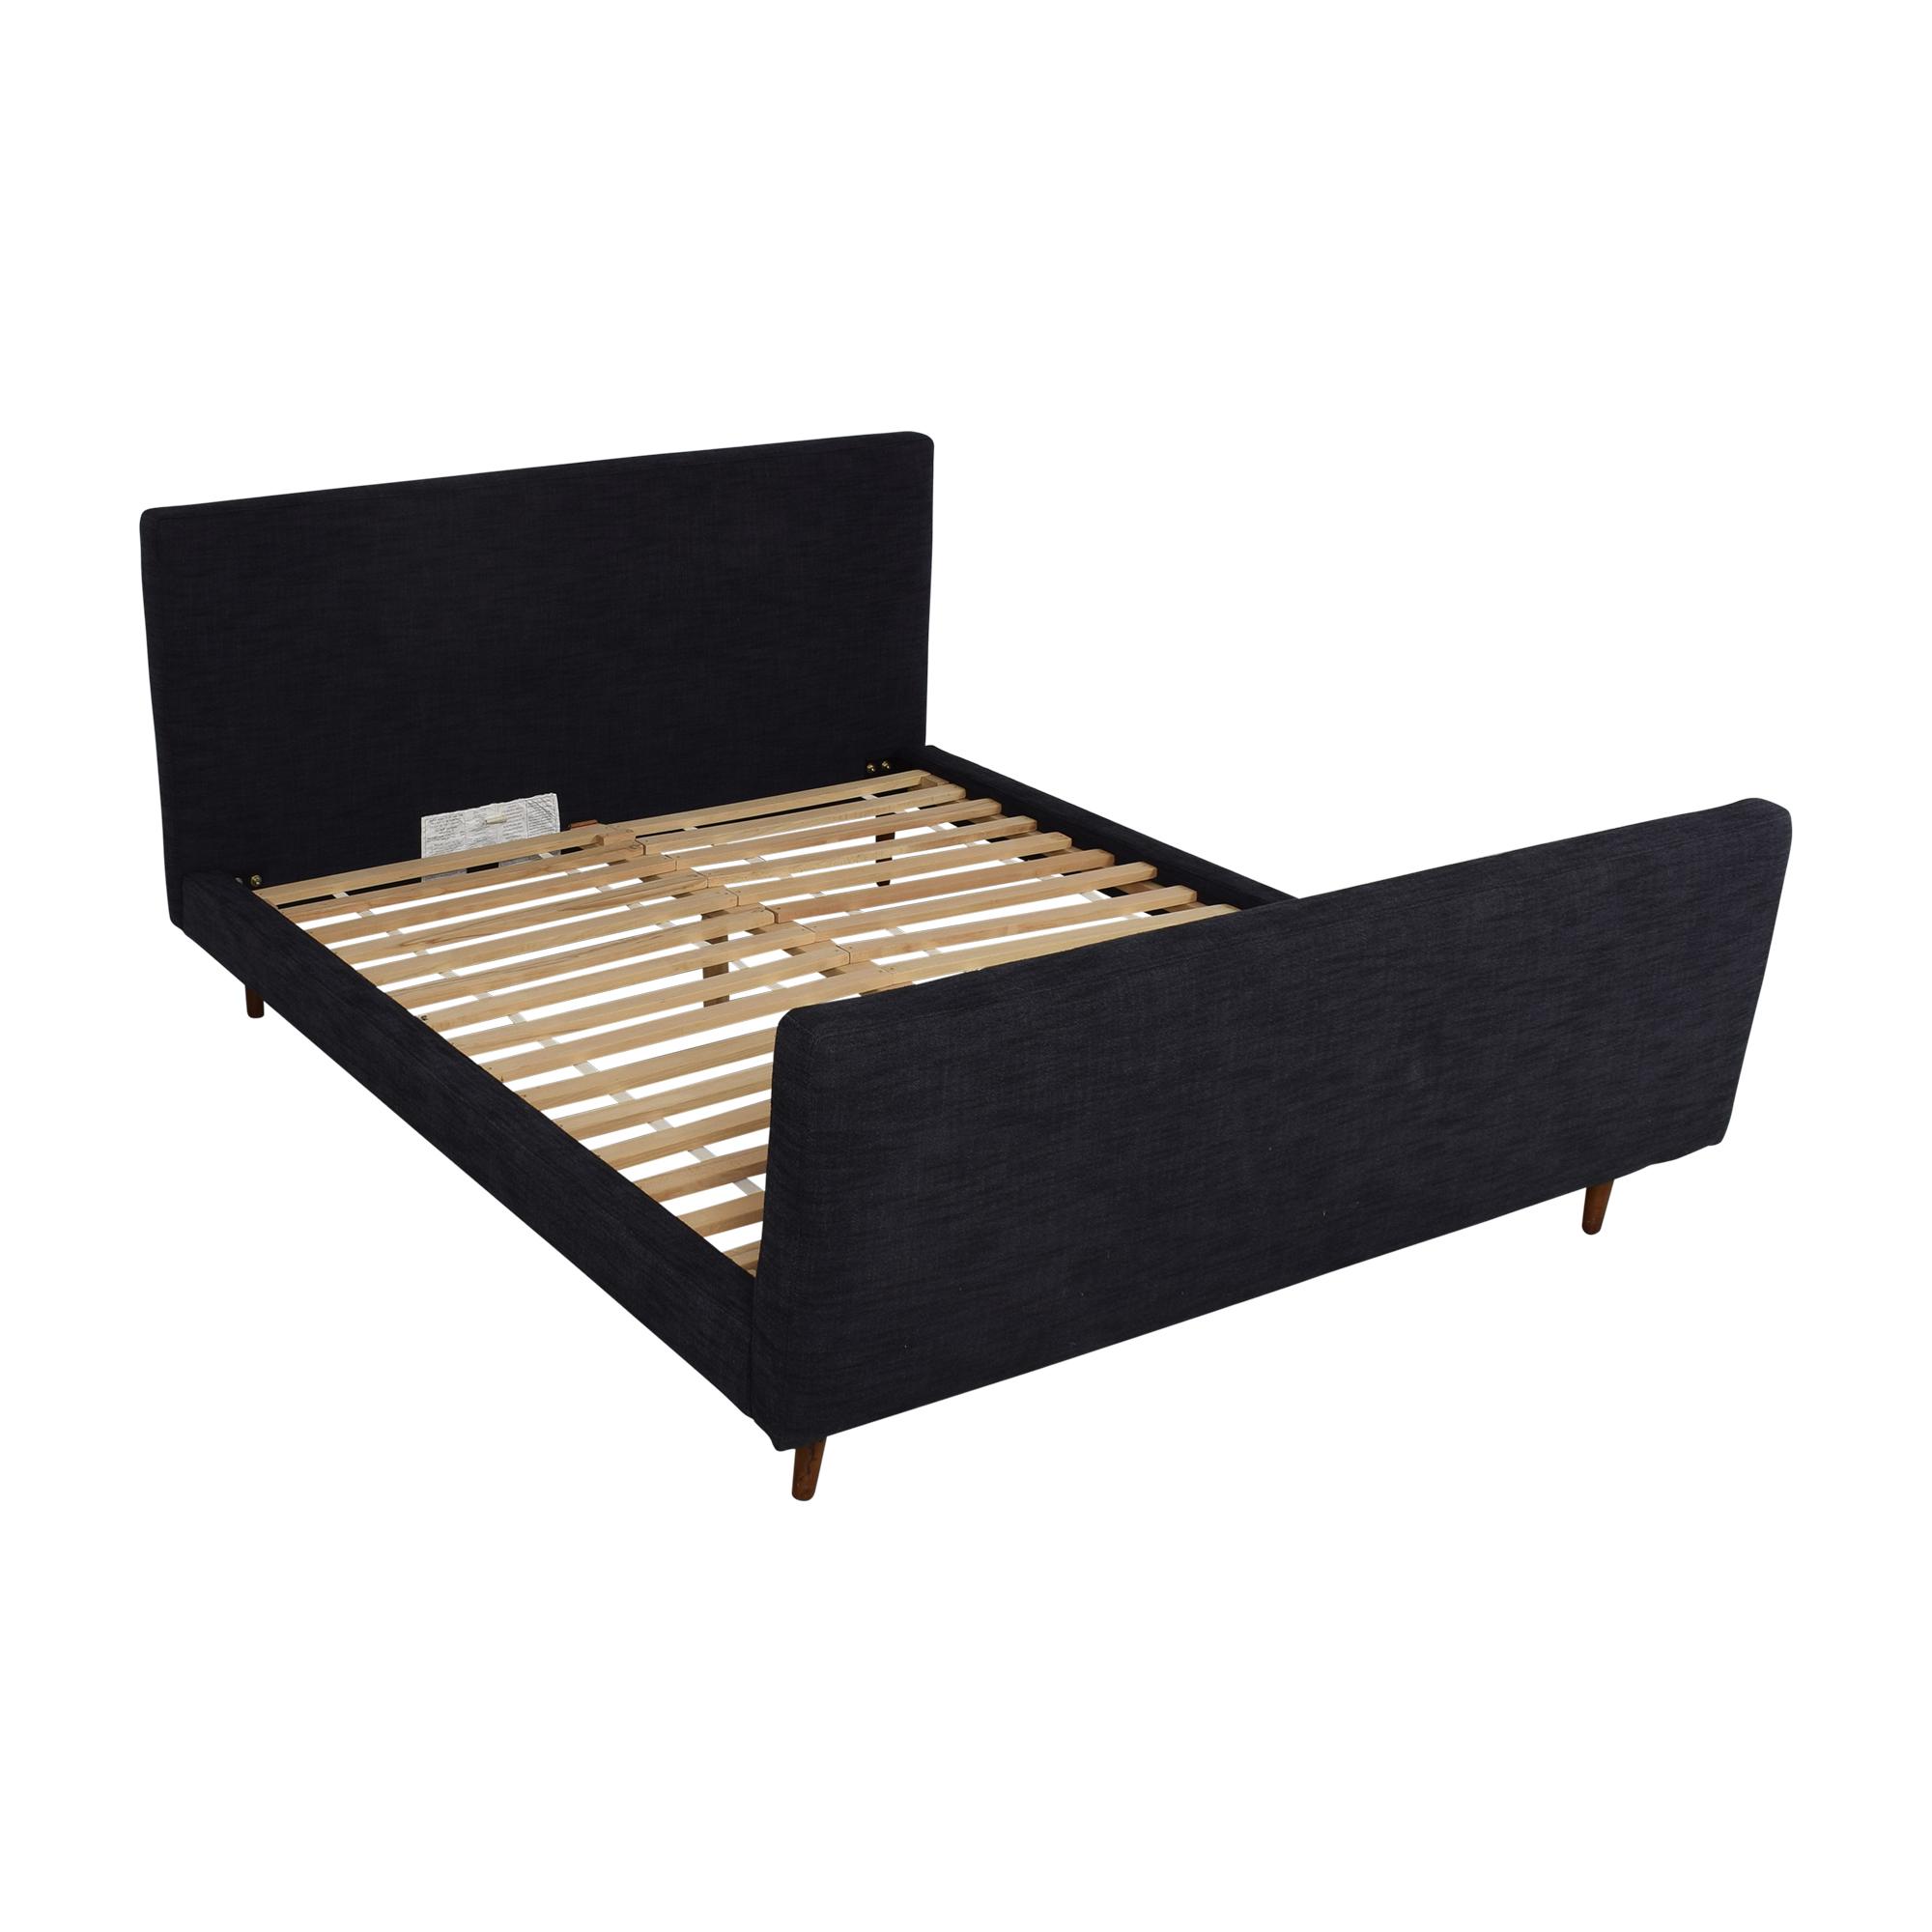 buy West Elm West Elm Queen Upholstered Bed with Footboard online